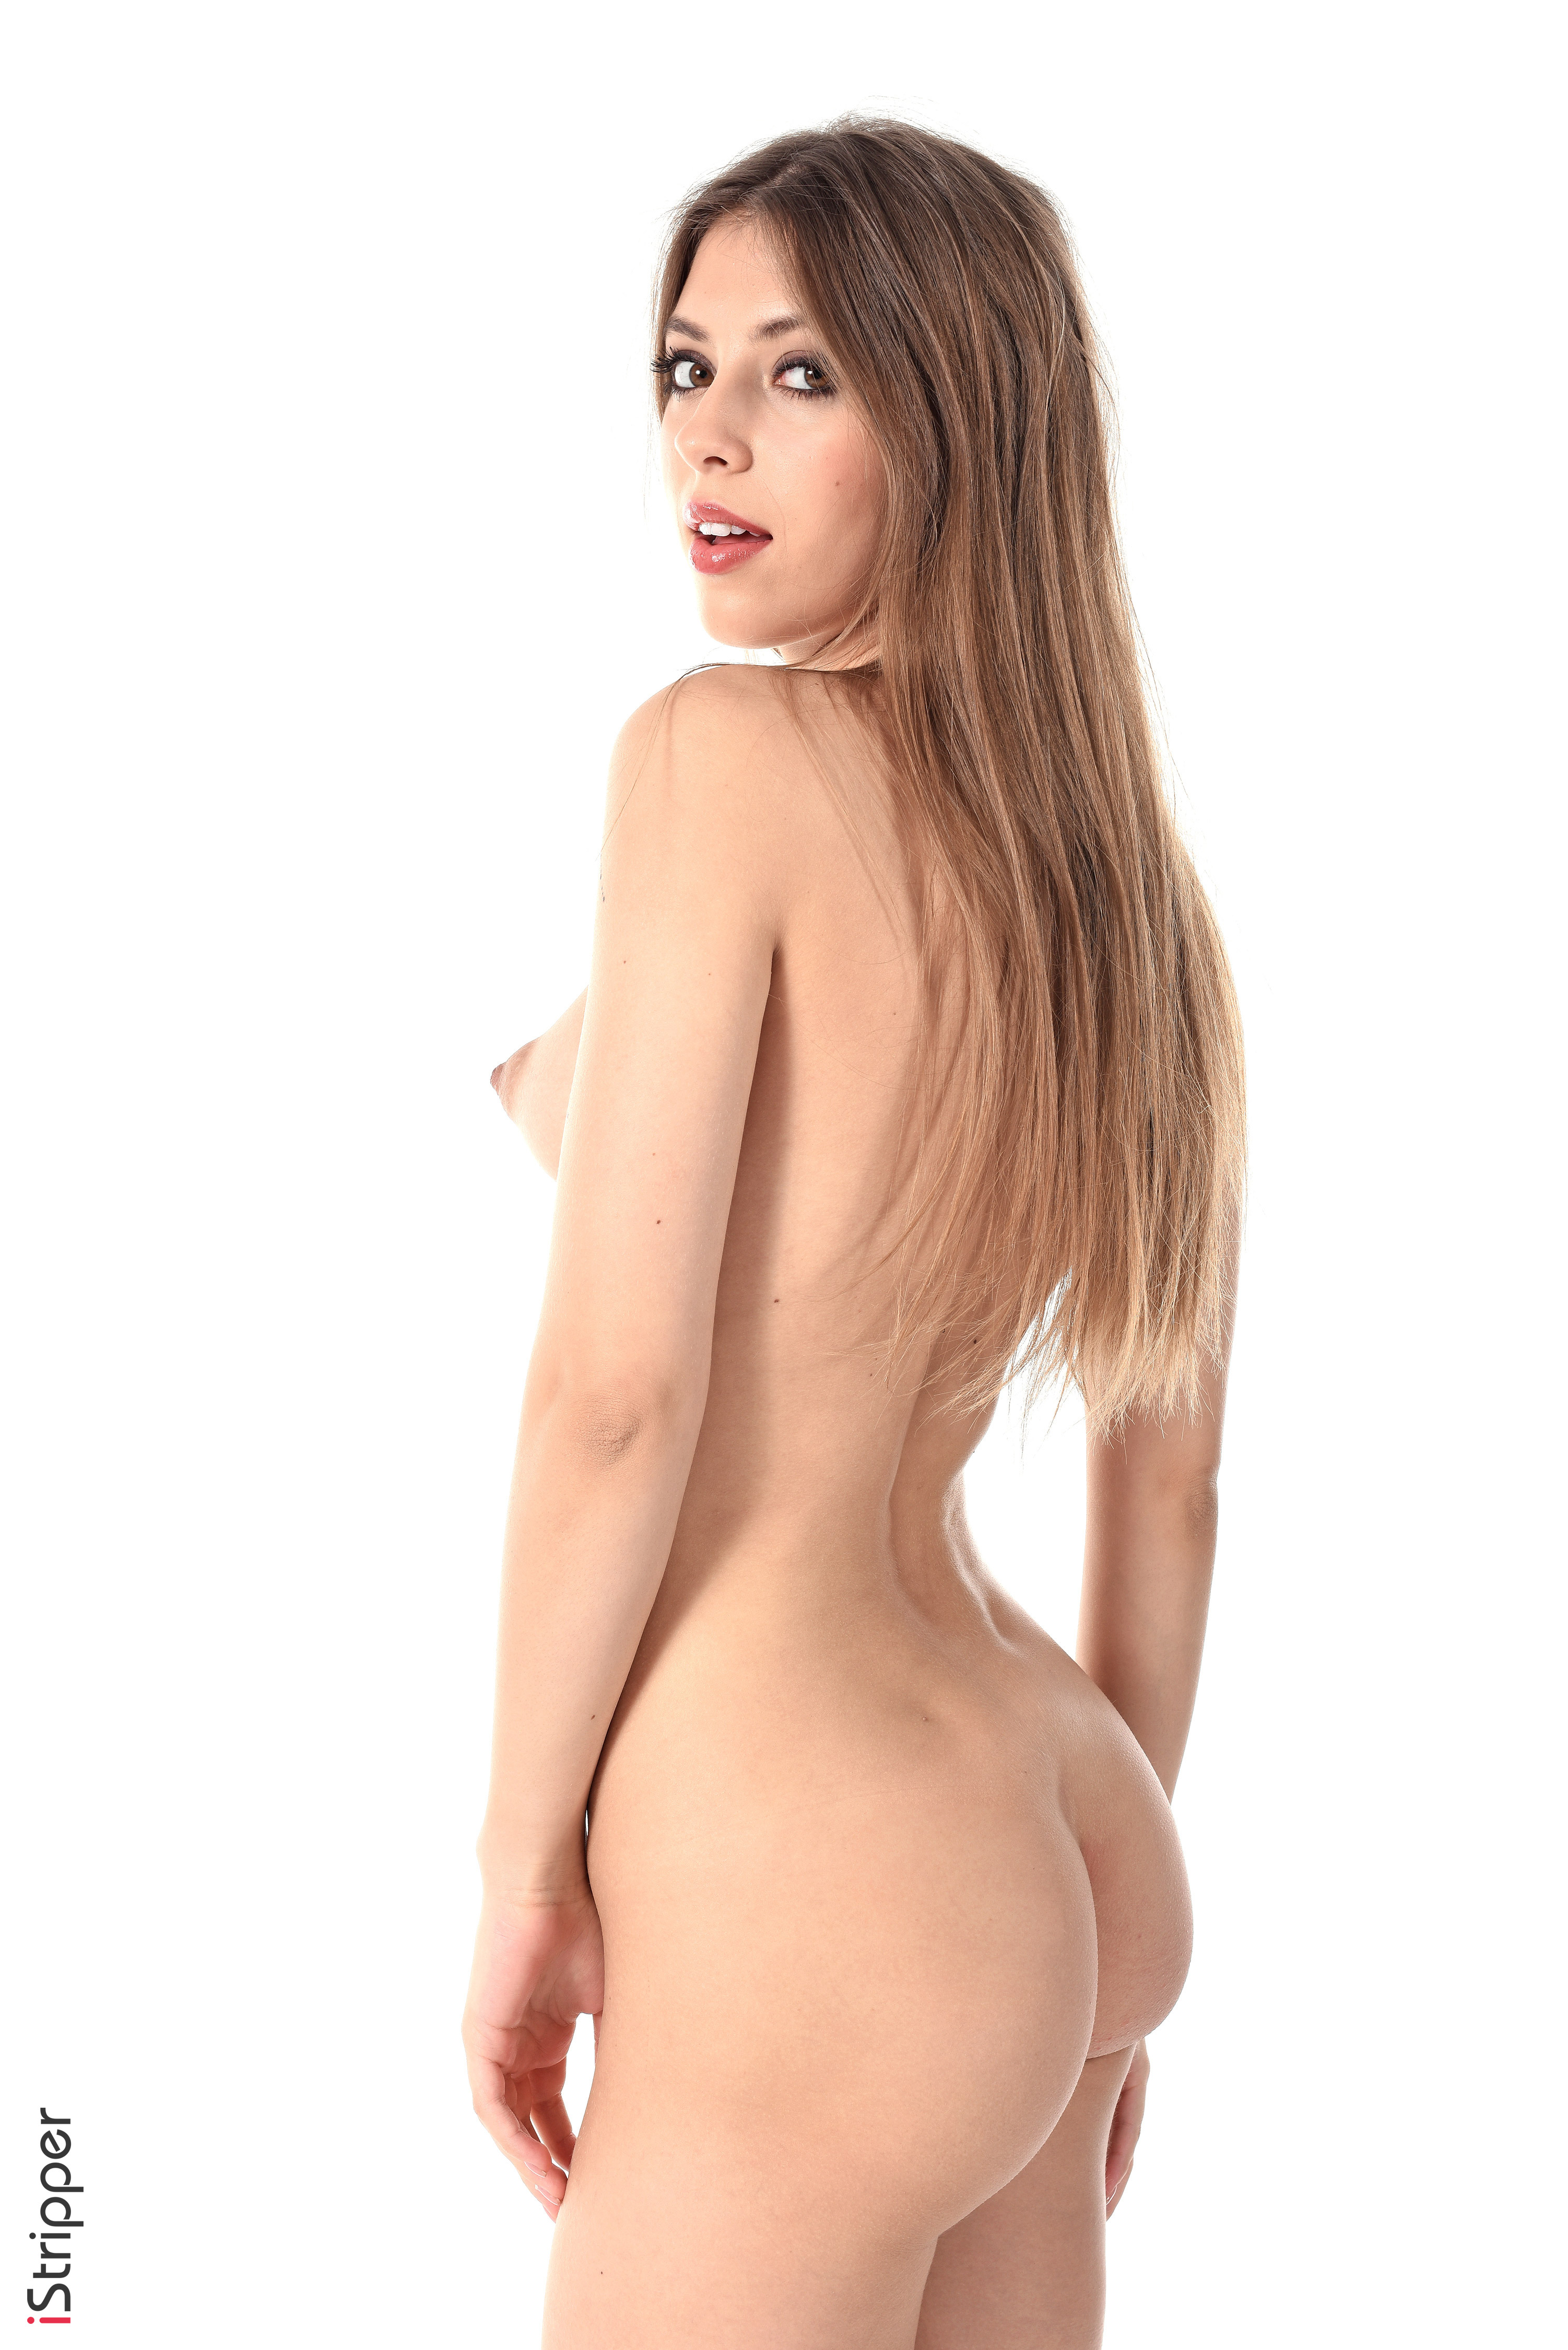 free virtua girl